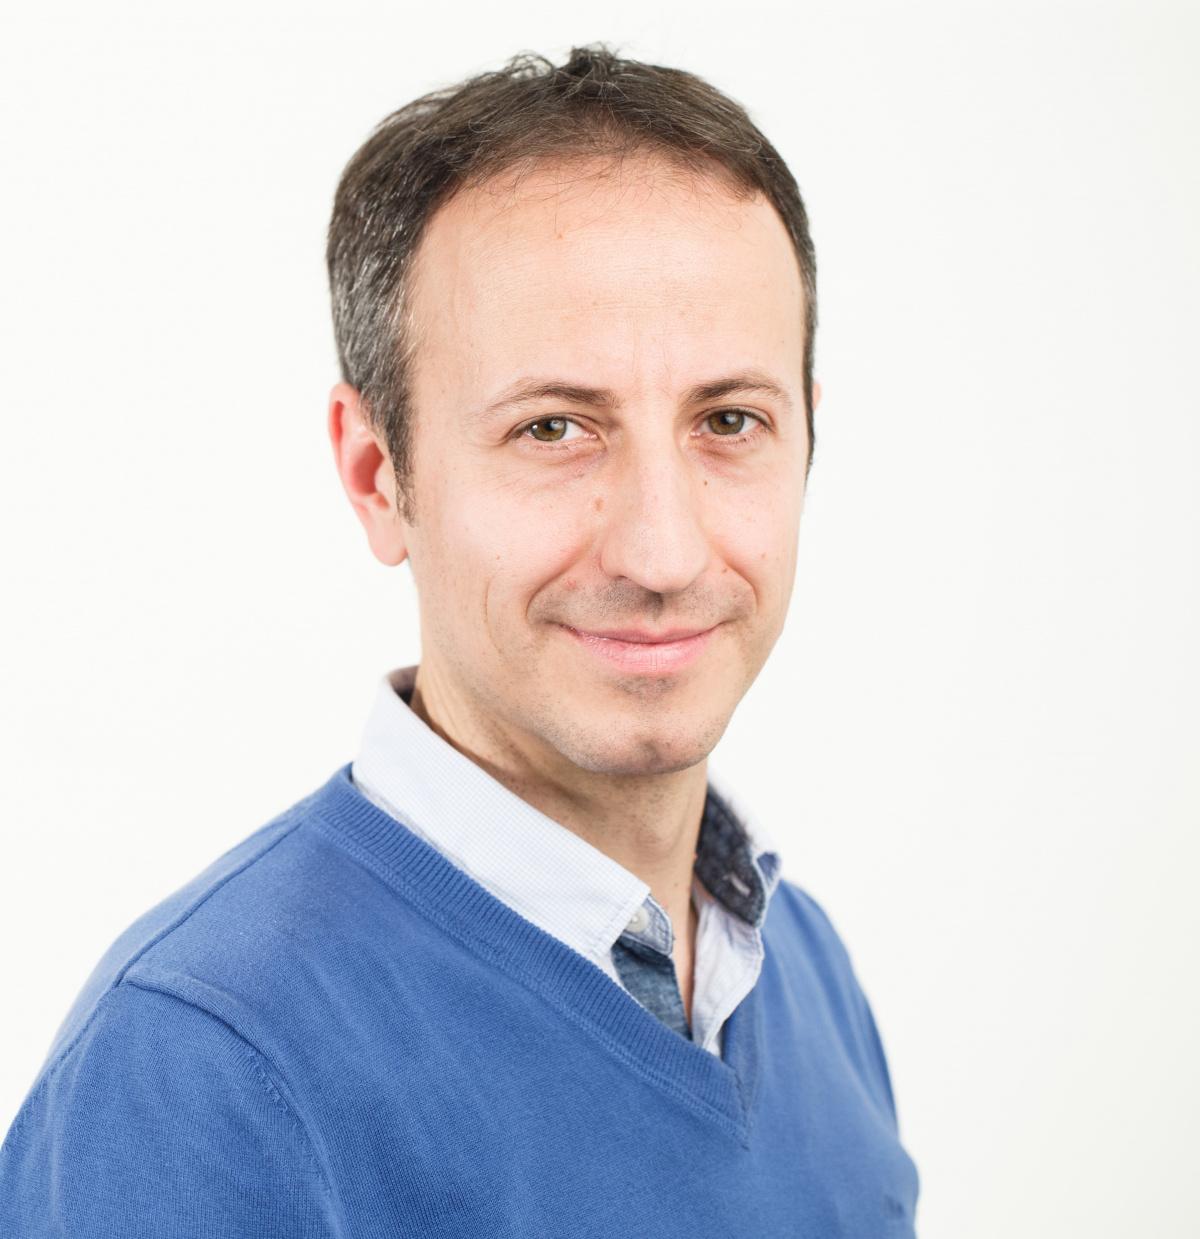 Profile picture for user Daniel Celarec